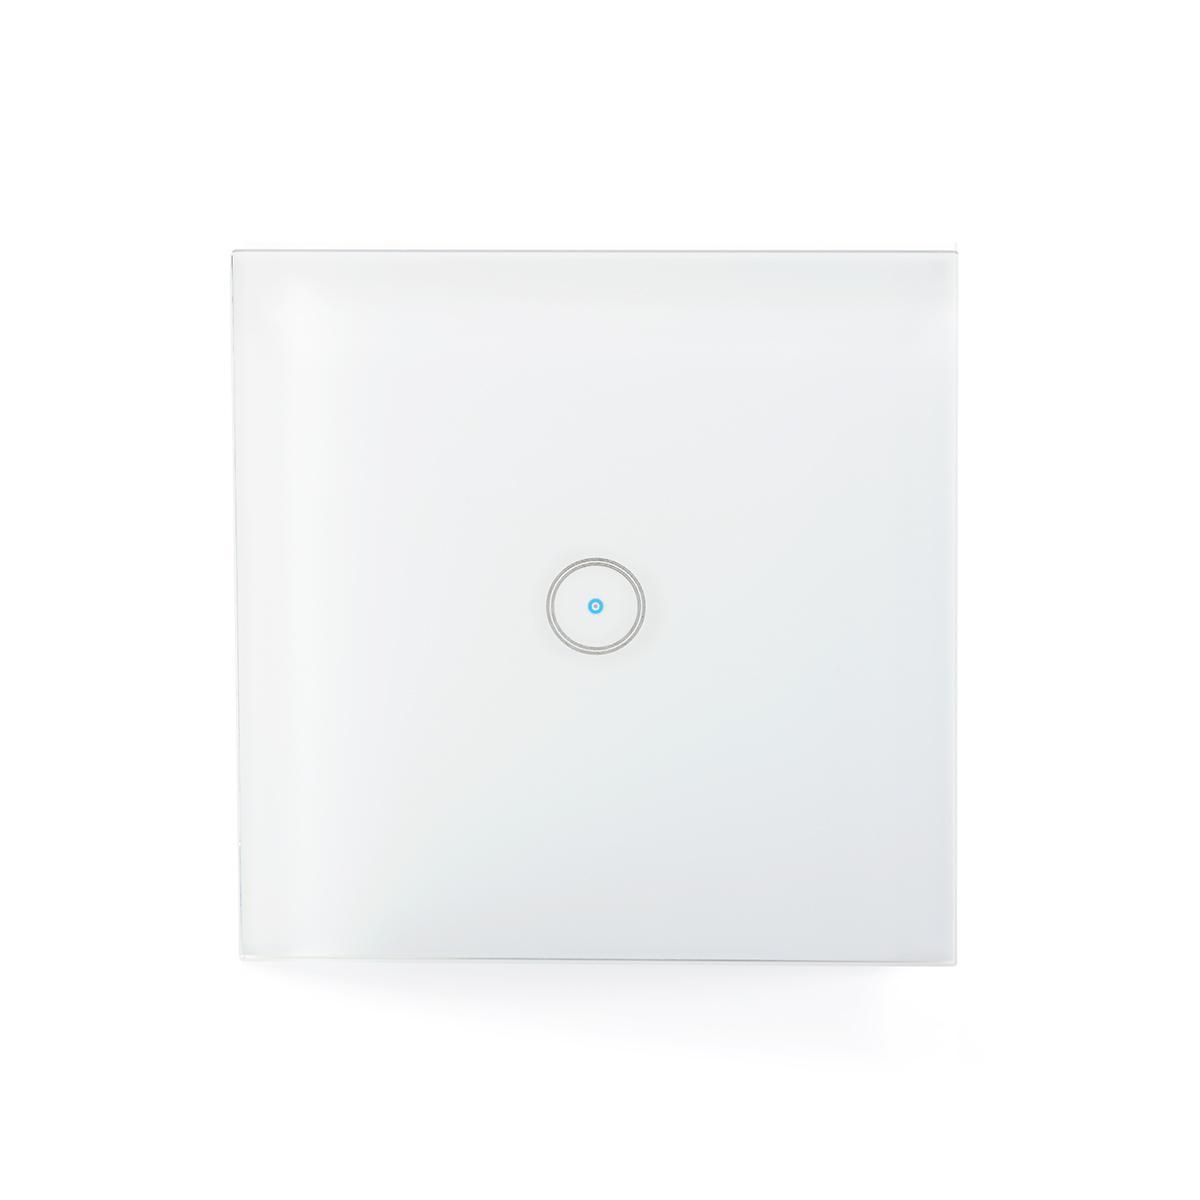 Nedis SmartLife WiFi Wall Switch